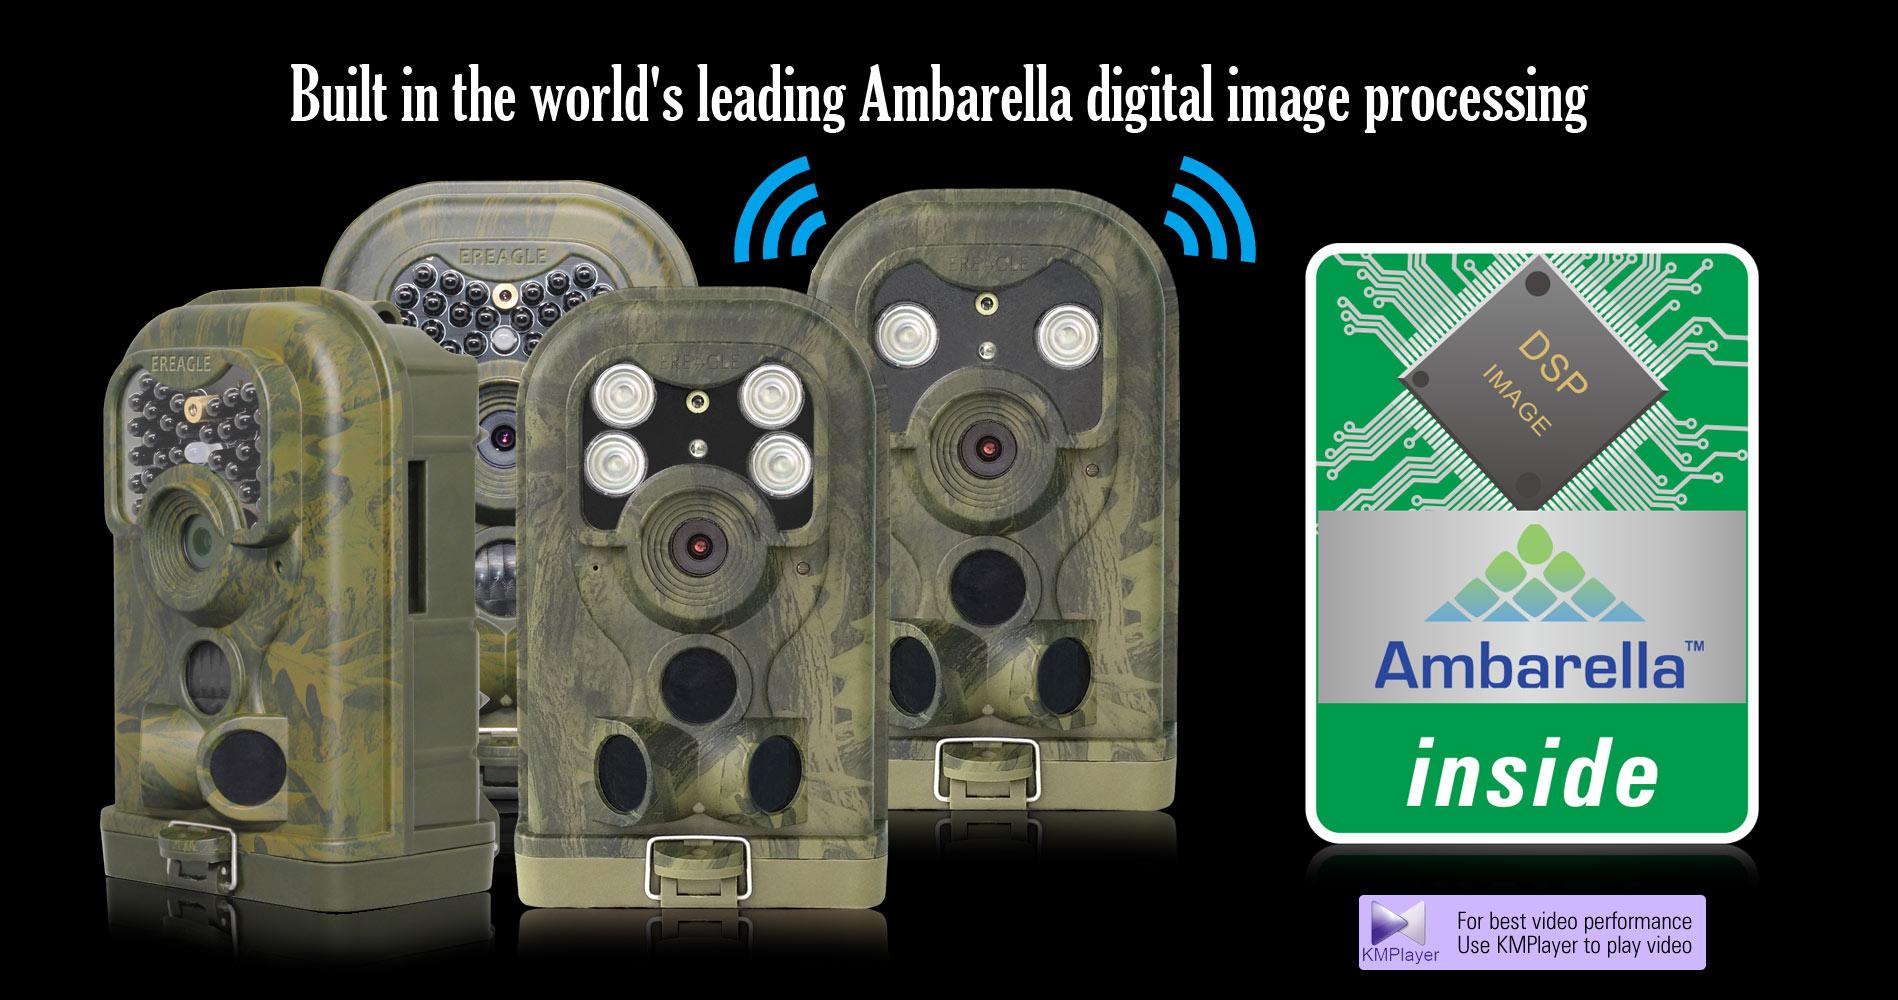 World best trail camera hunting game camera image process solution Ambarella chipset